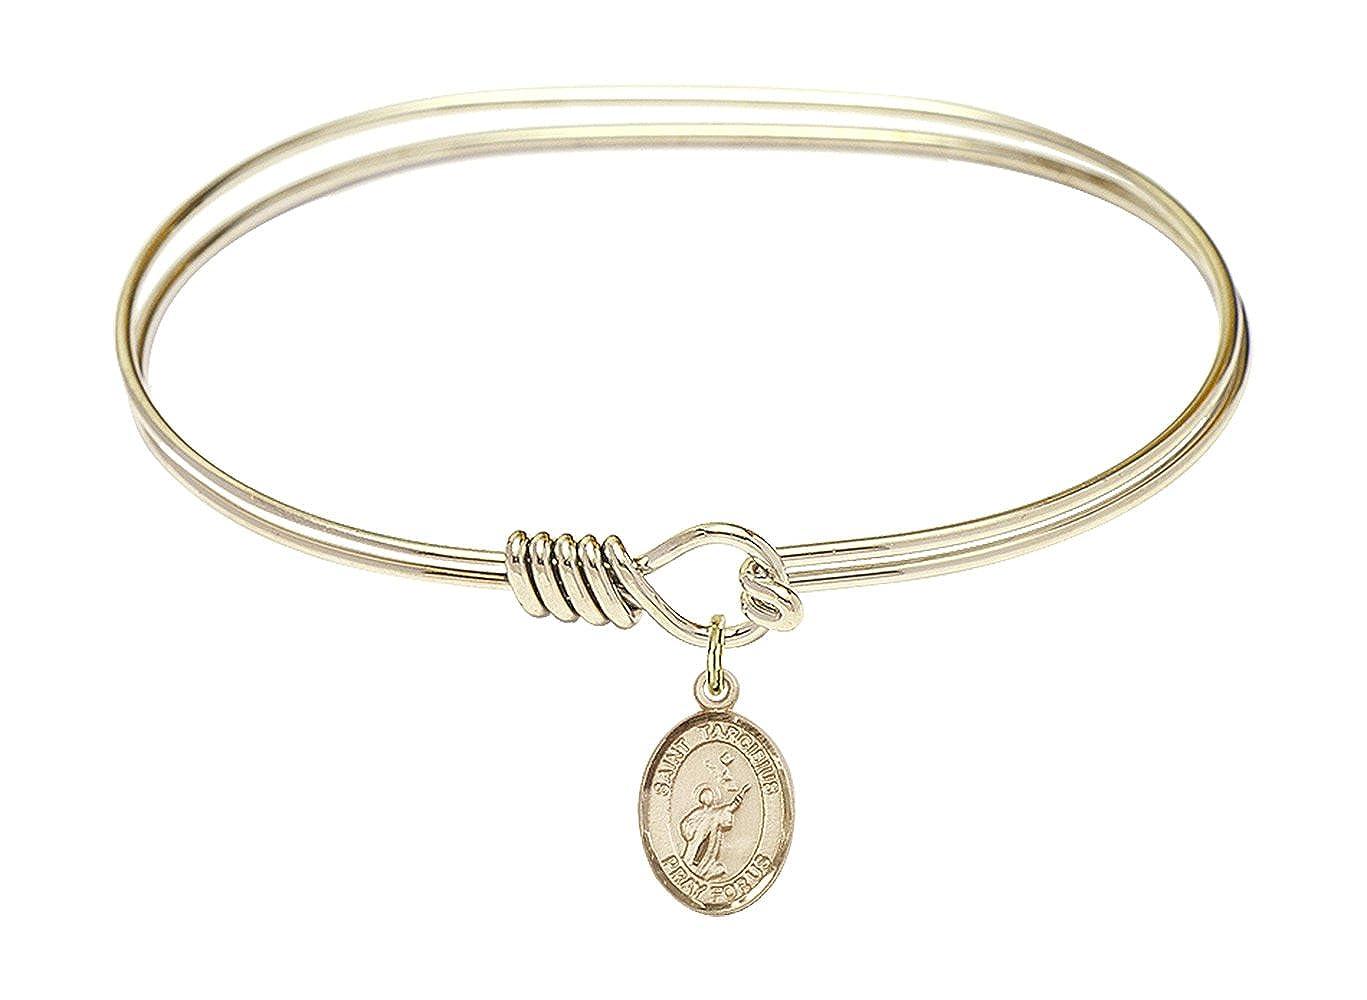 DiamondJewelryNY Eye Hook Bangle Bracelet with a St Tarcisius Charm.